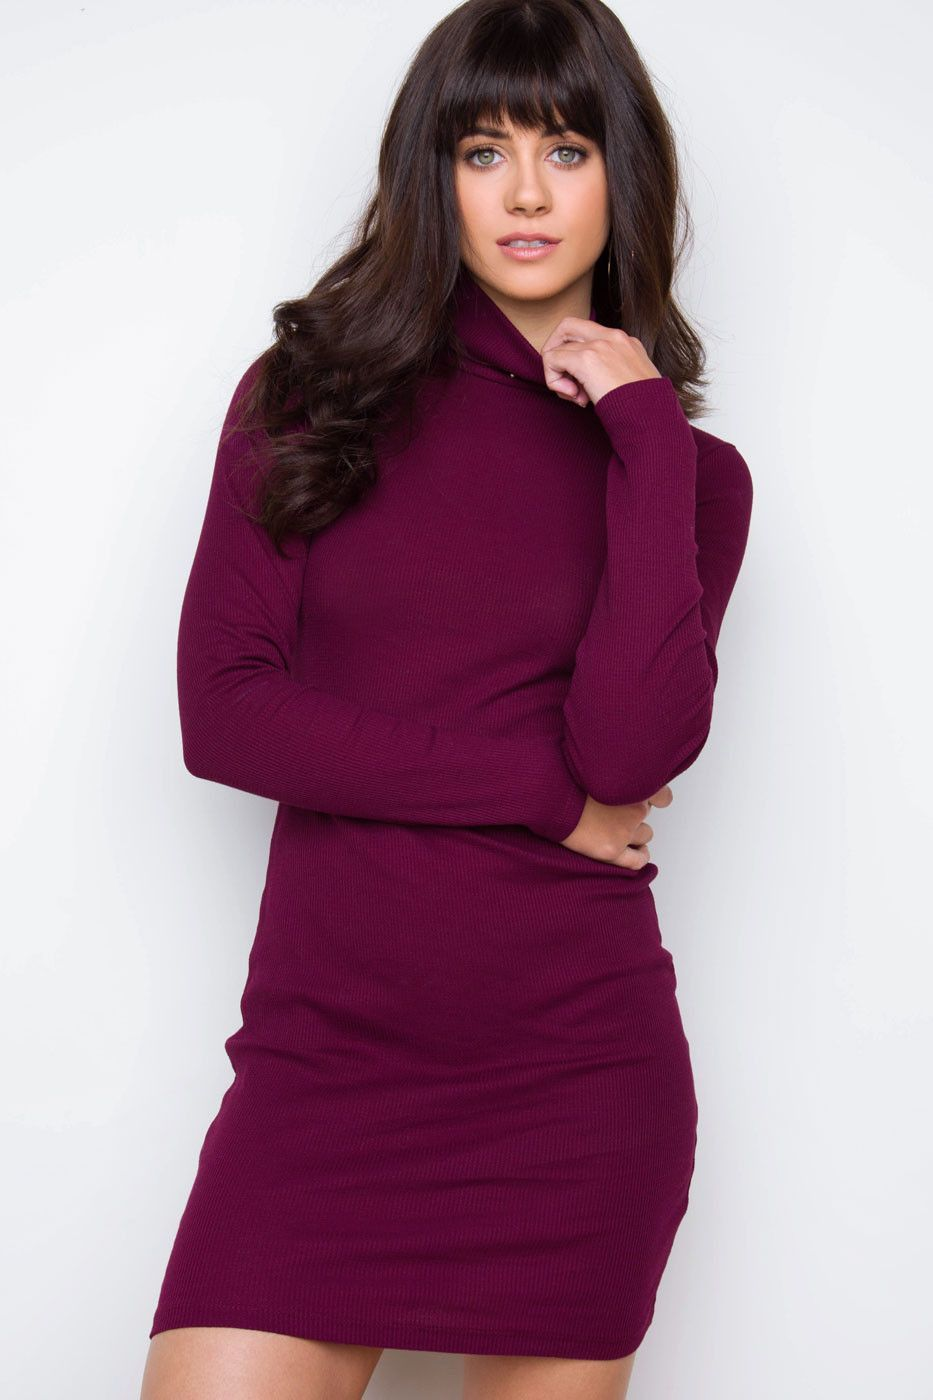 Dana Turtleneck Sweater Dress - Burgundy | Products | Pinterest